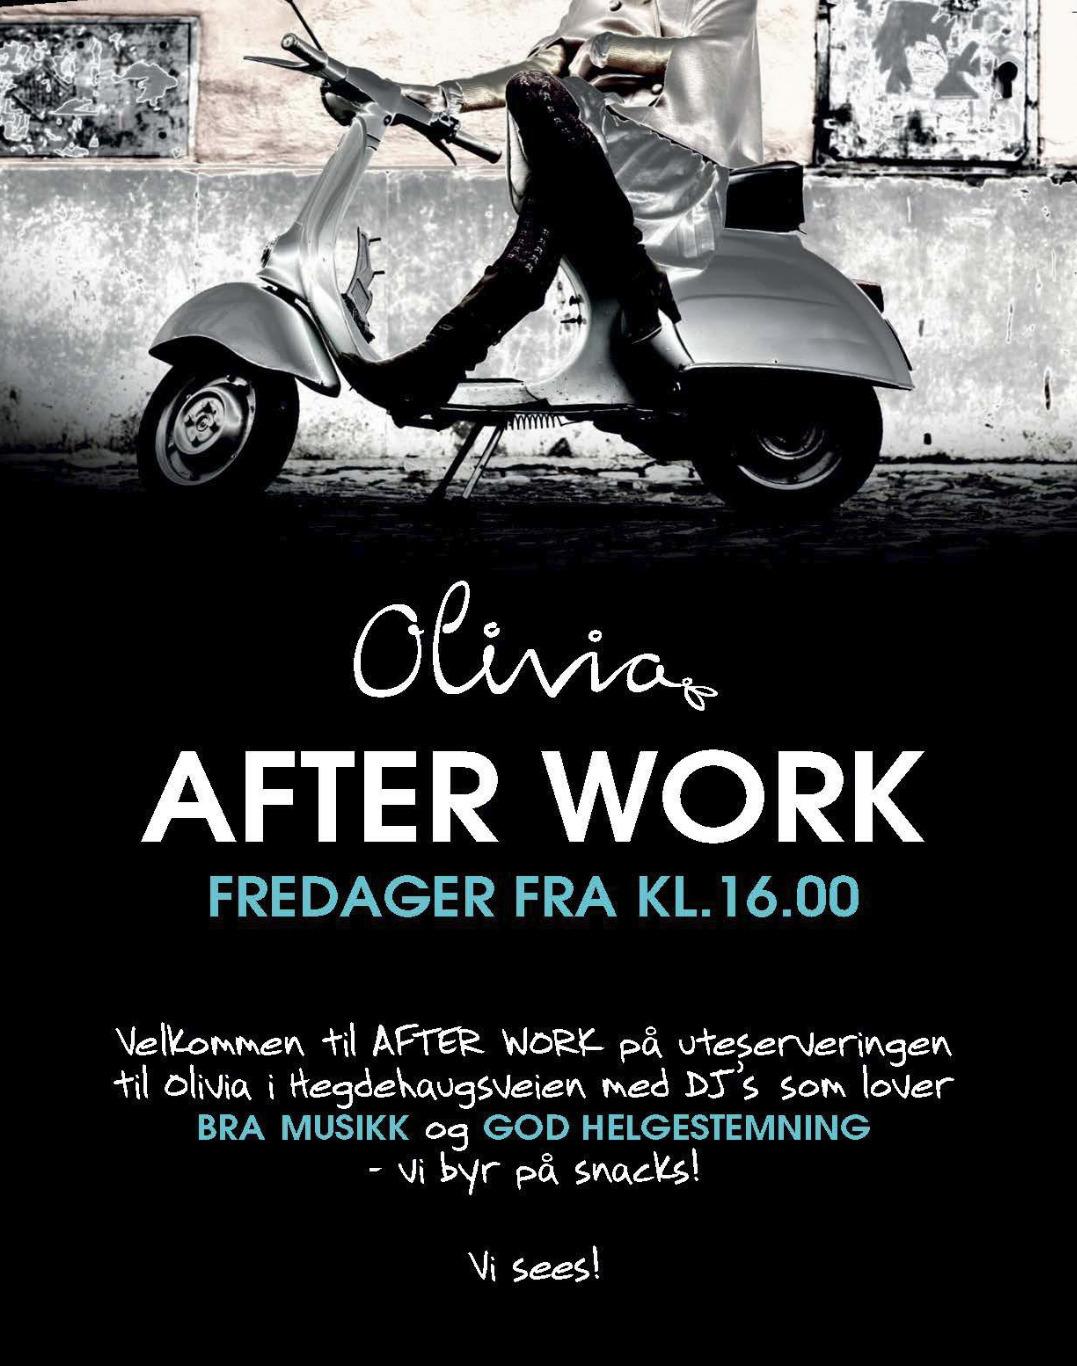 Afterwork flyer